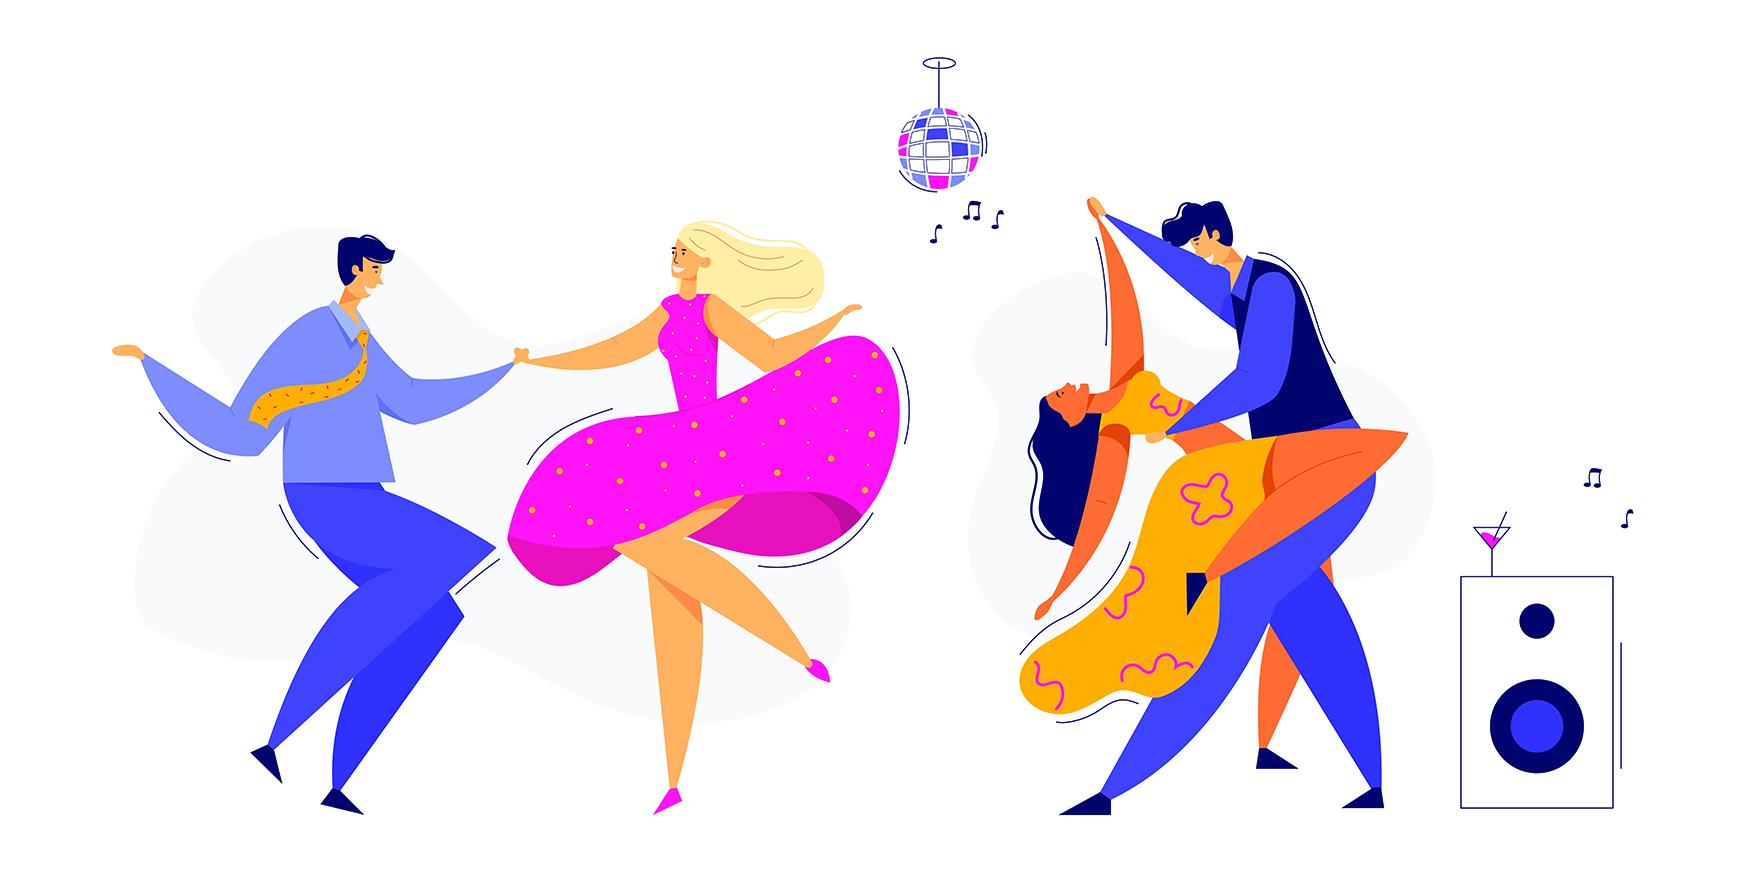 Soirée dansante THEMACAFE MONTPELLIER